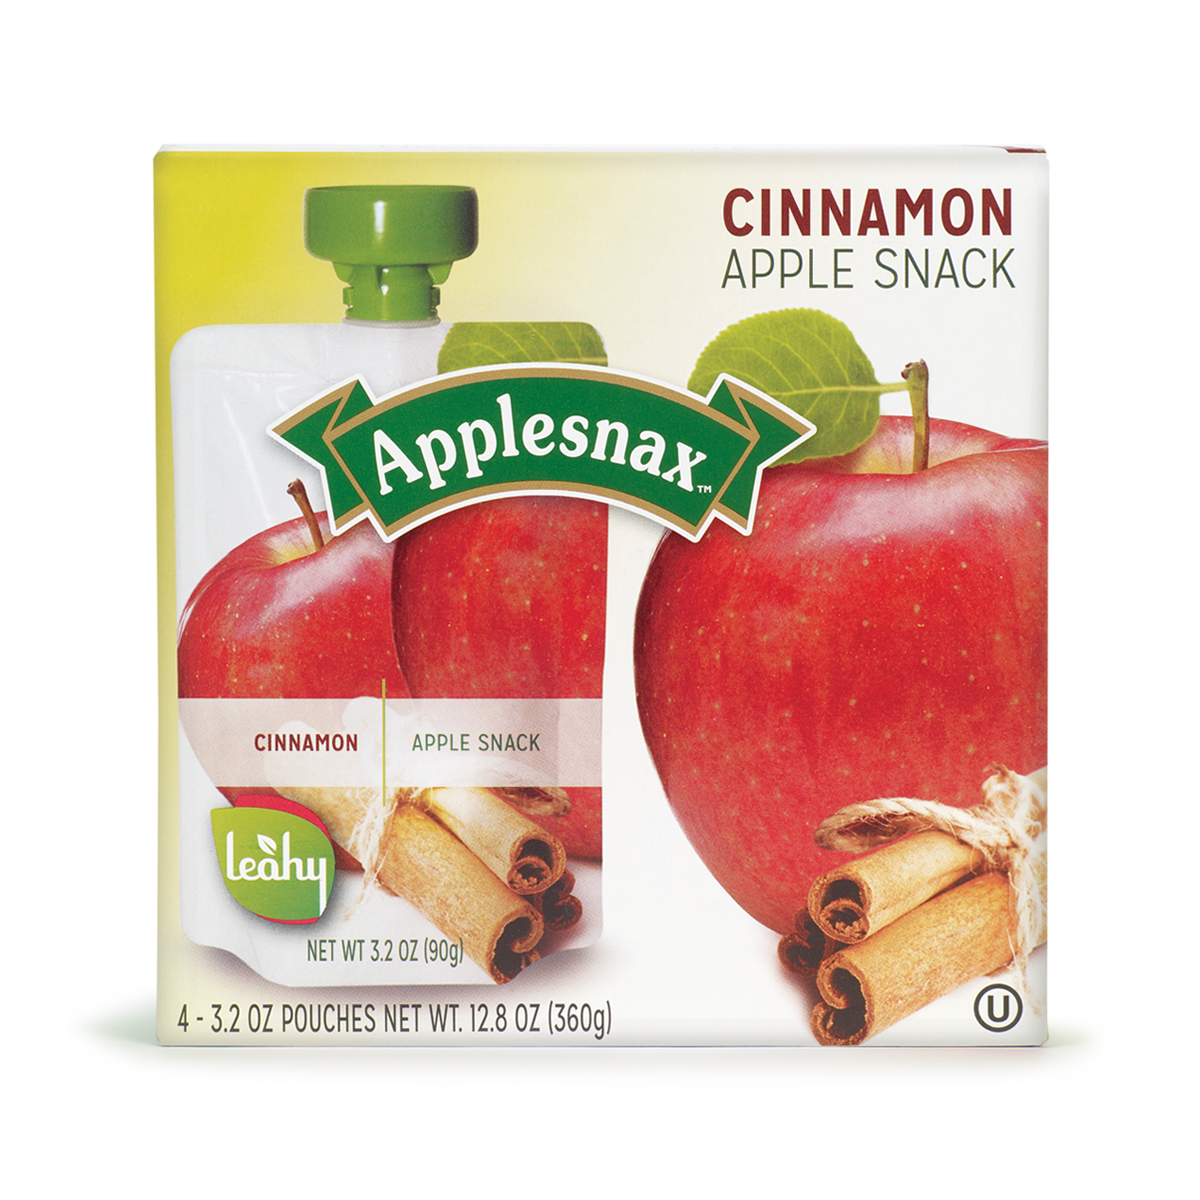 Boite 4 Pouch Applesnax Cinnamon Usa